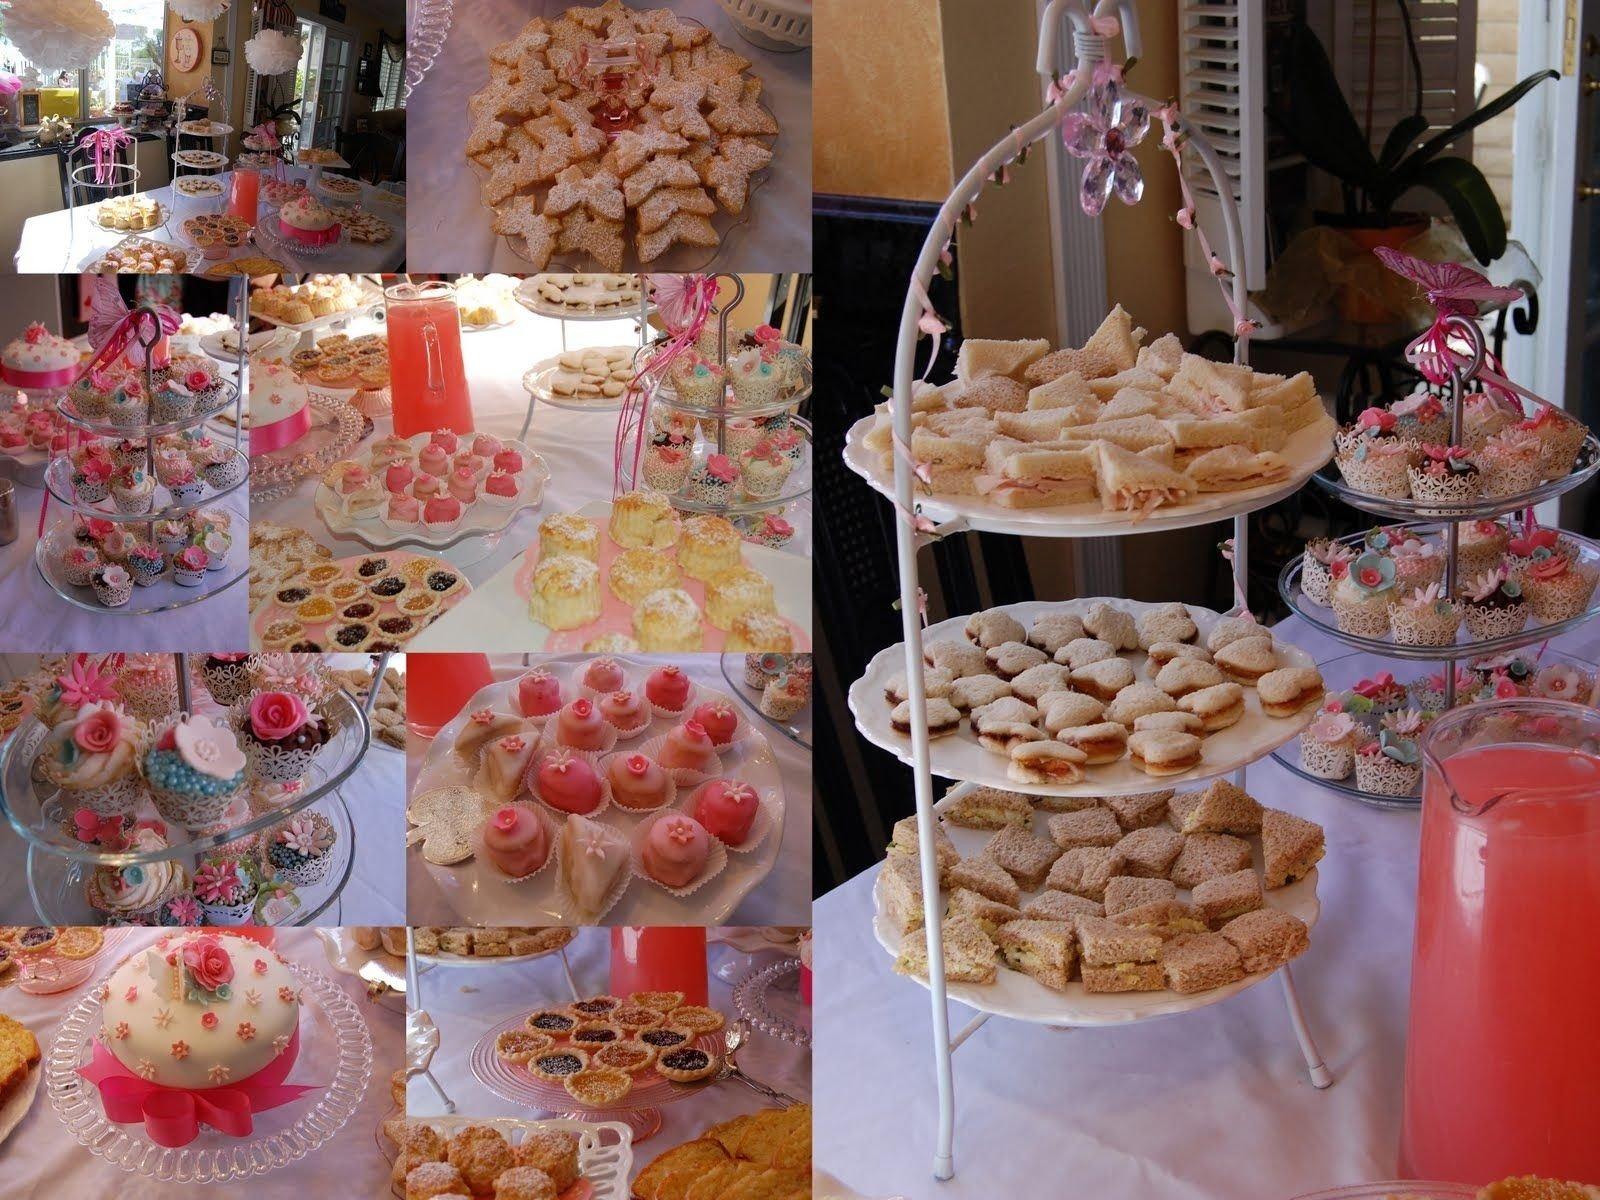 10 Wonderful Tea Party Ideas For Little Girls pretty tea food girls tea party ideas english rose teas little 1 2021